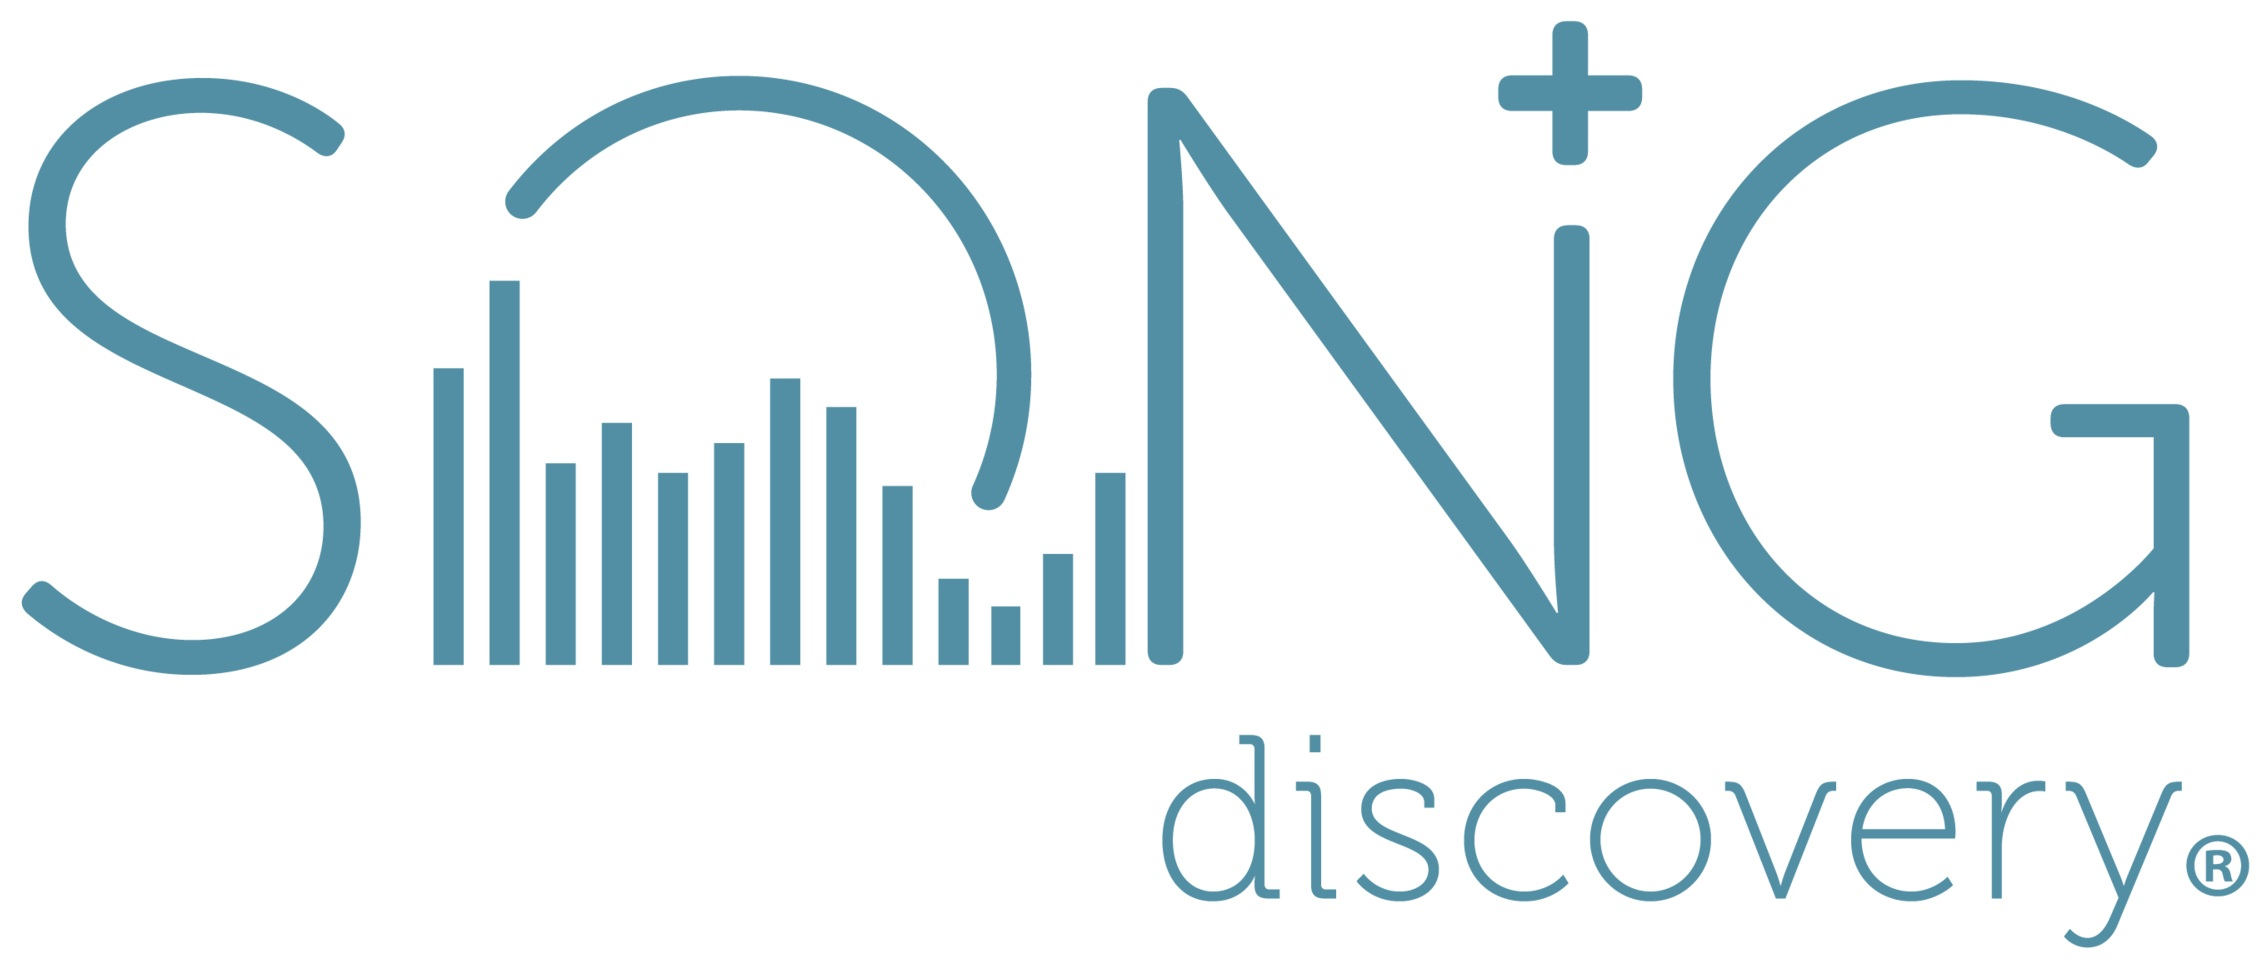 Song+Discovery+Logo_blue.jpg